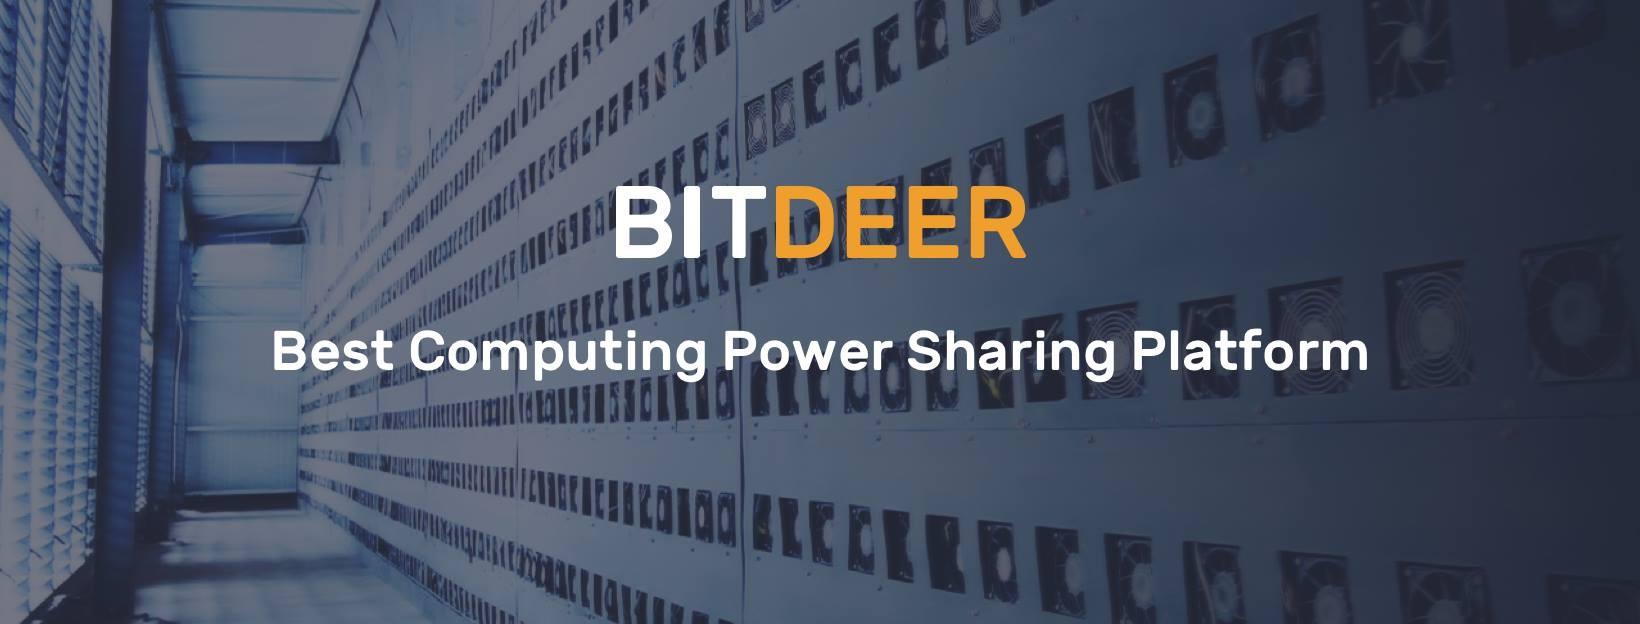 Bitdeer, nouvel acteur du minage de Bitcoin